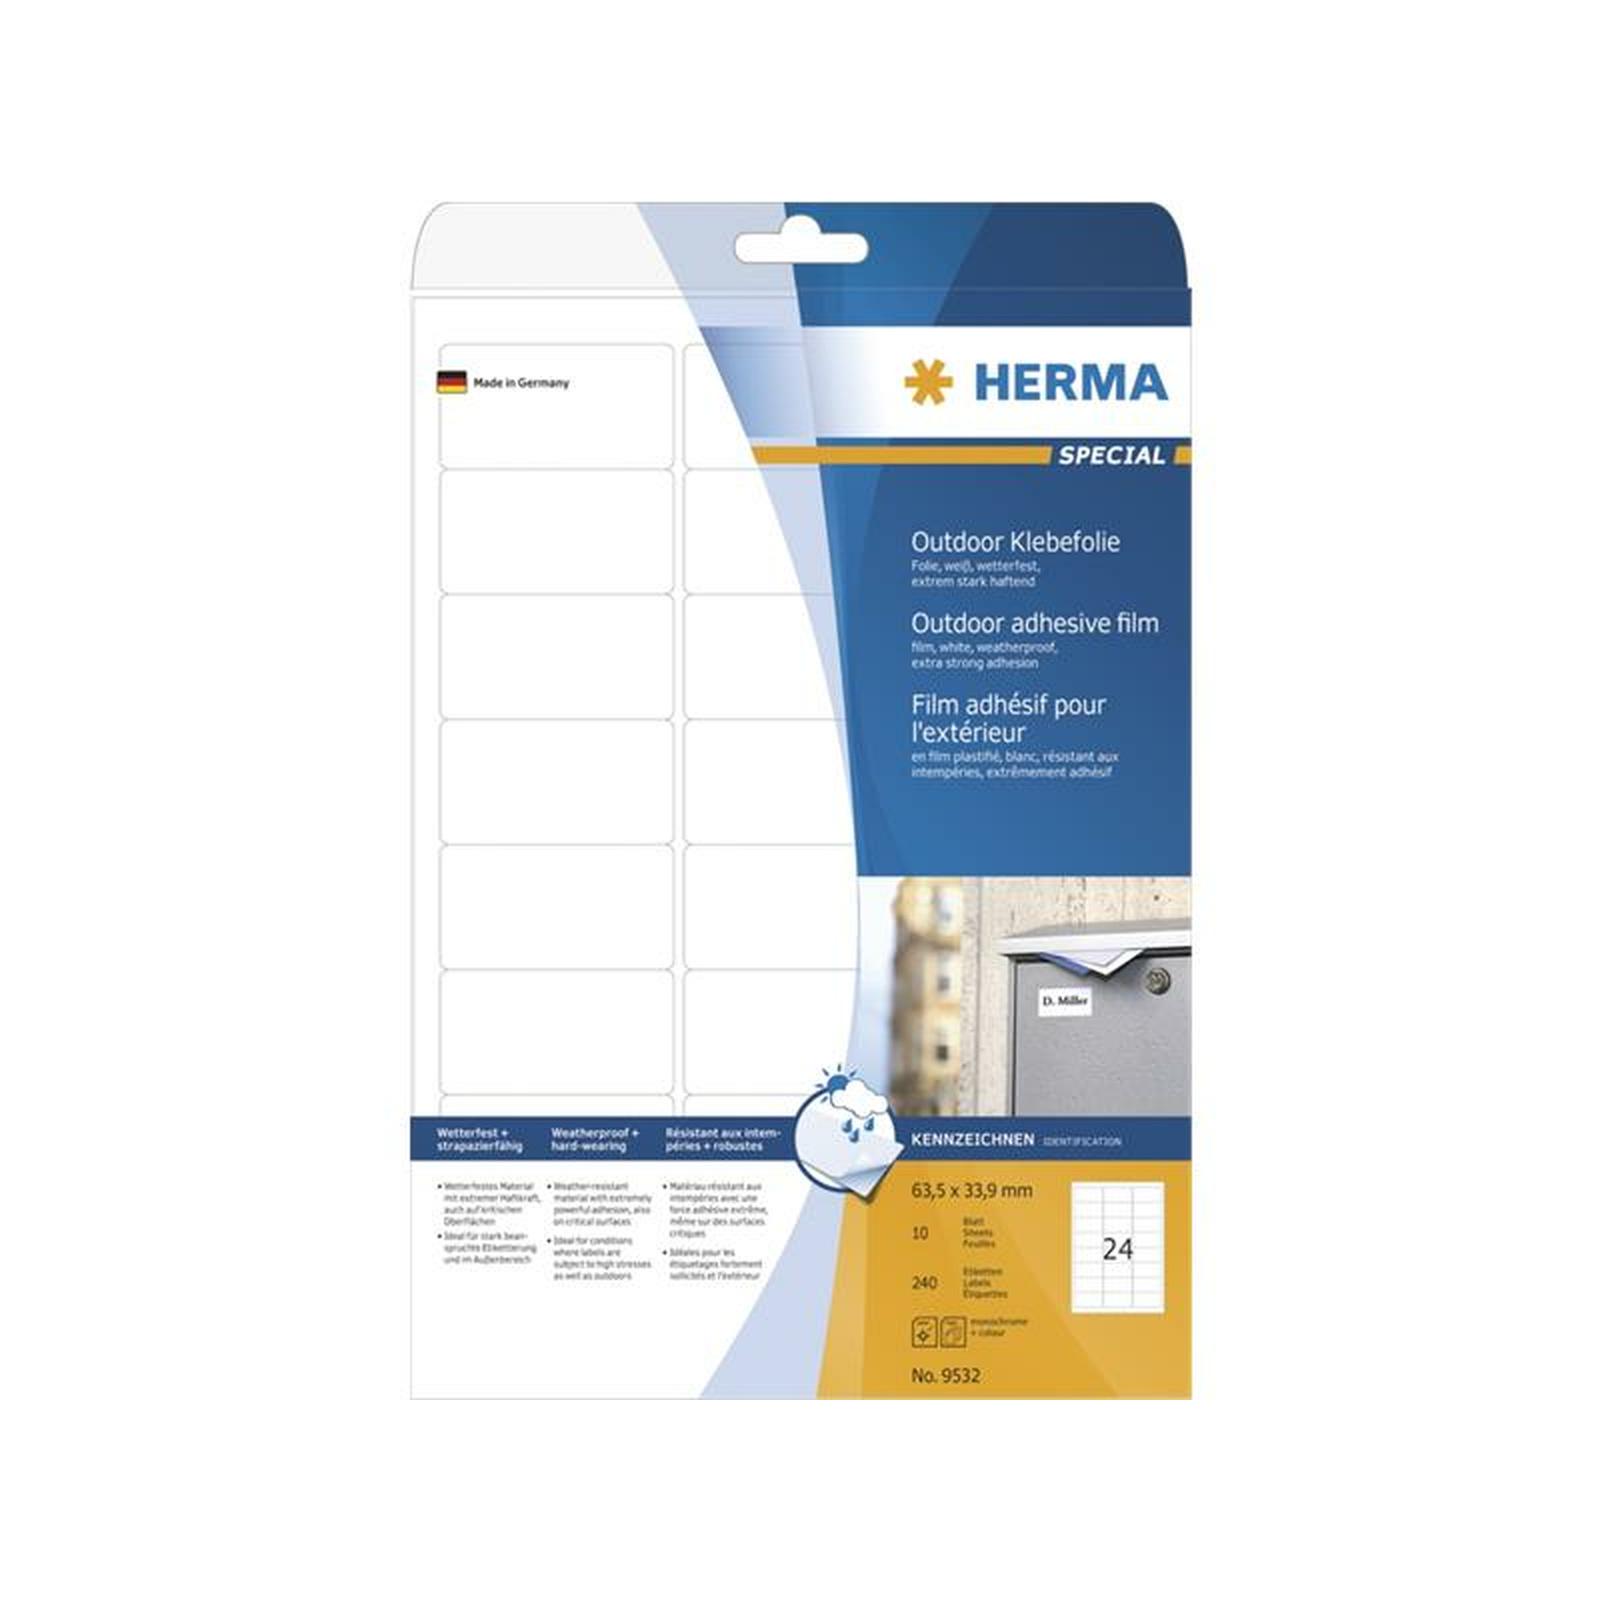 Herma etiketten a4 outdoor klebefolie wei 63 5x33 9 mm for Klebefolie abwaschbar